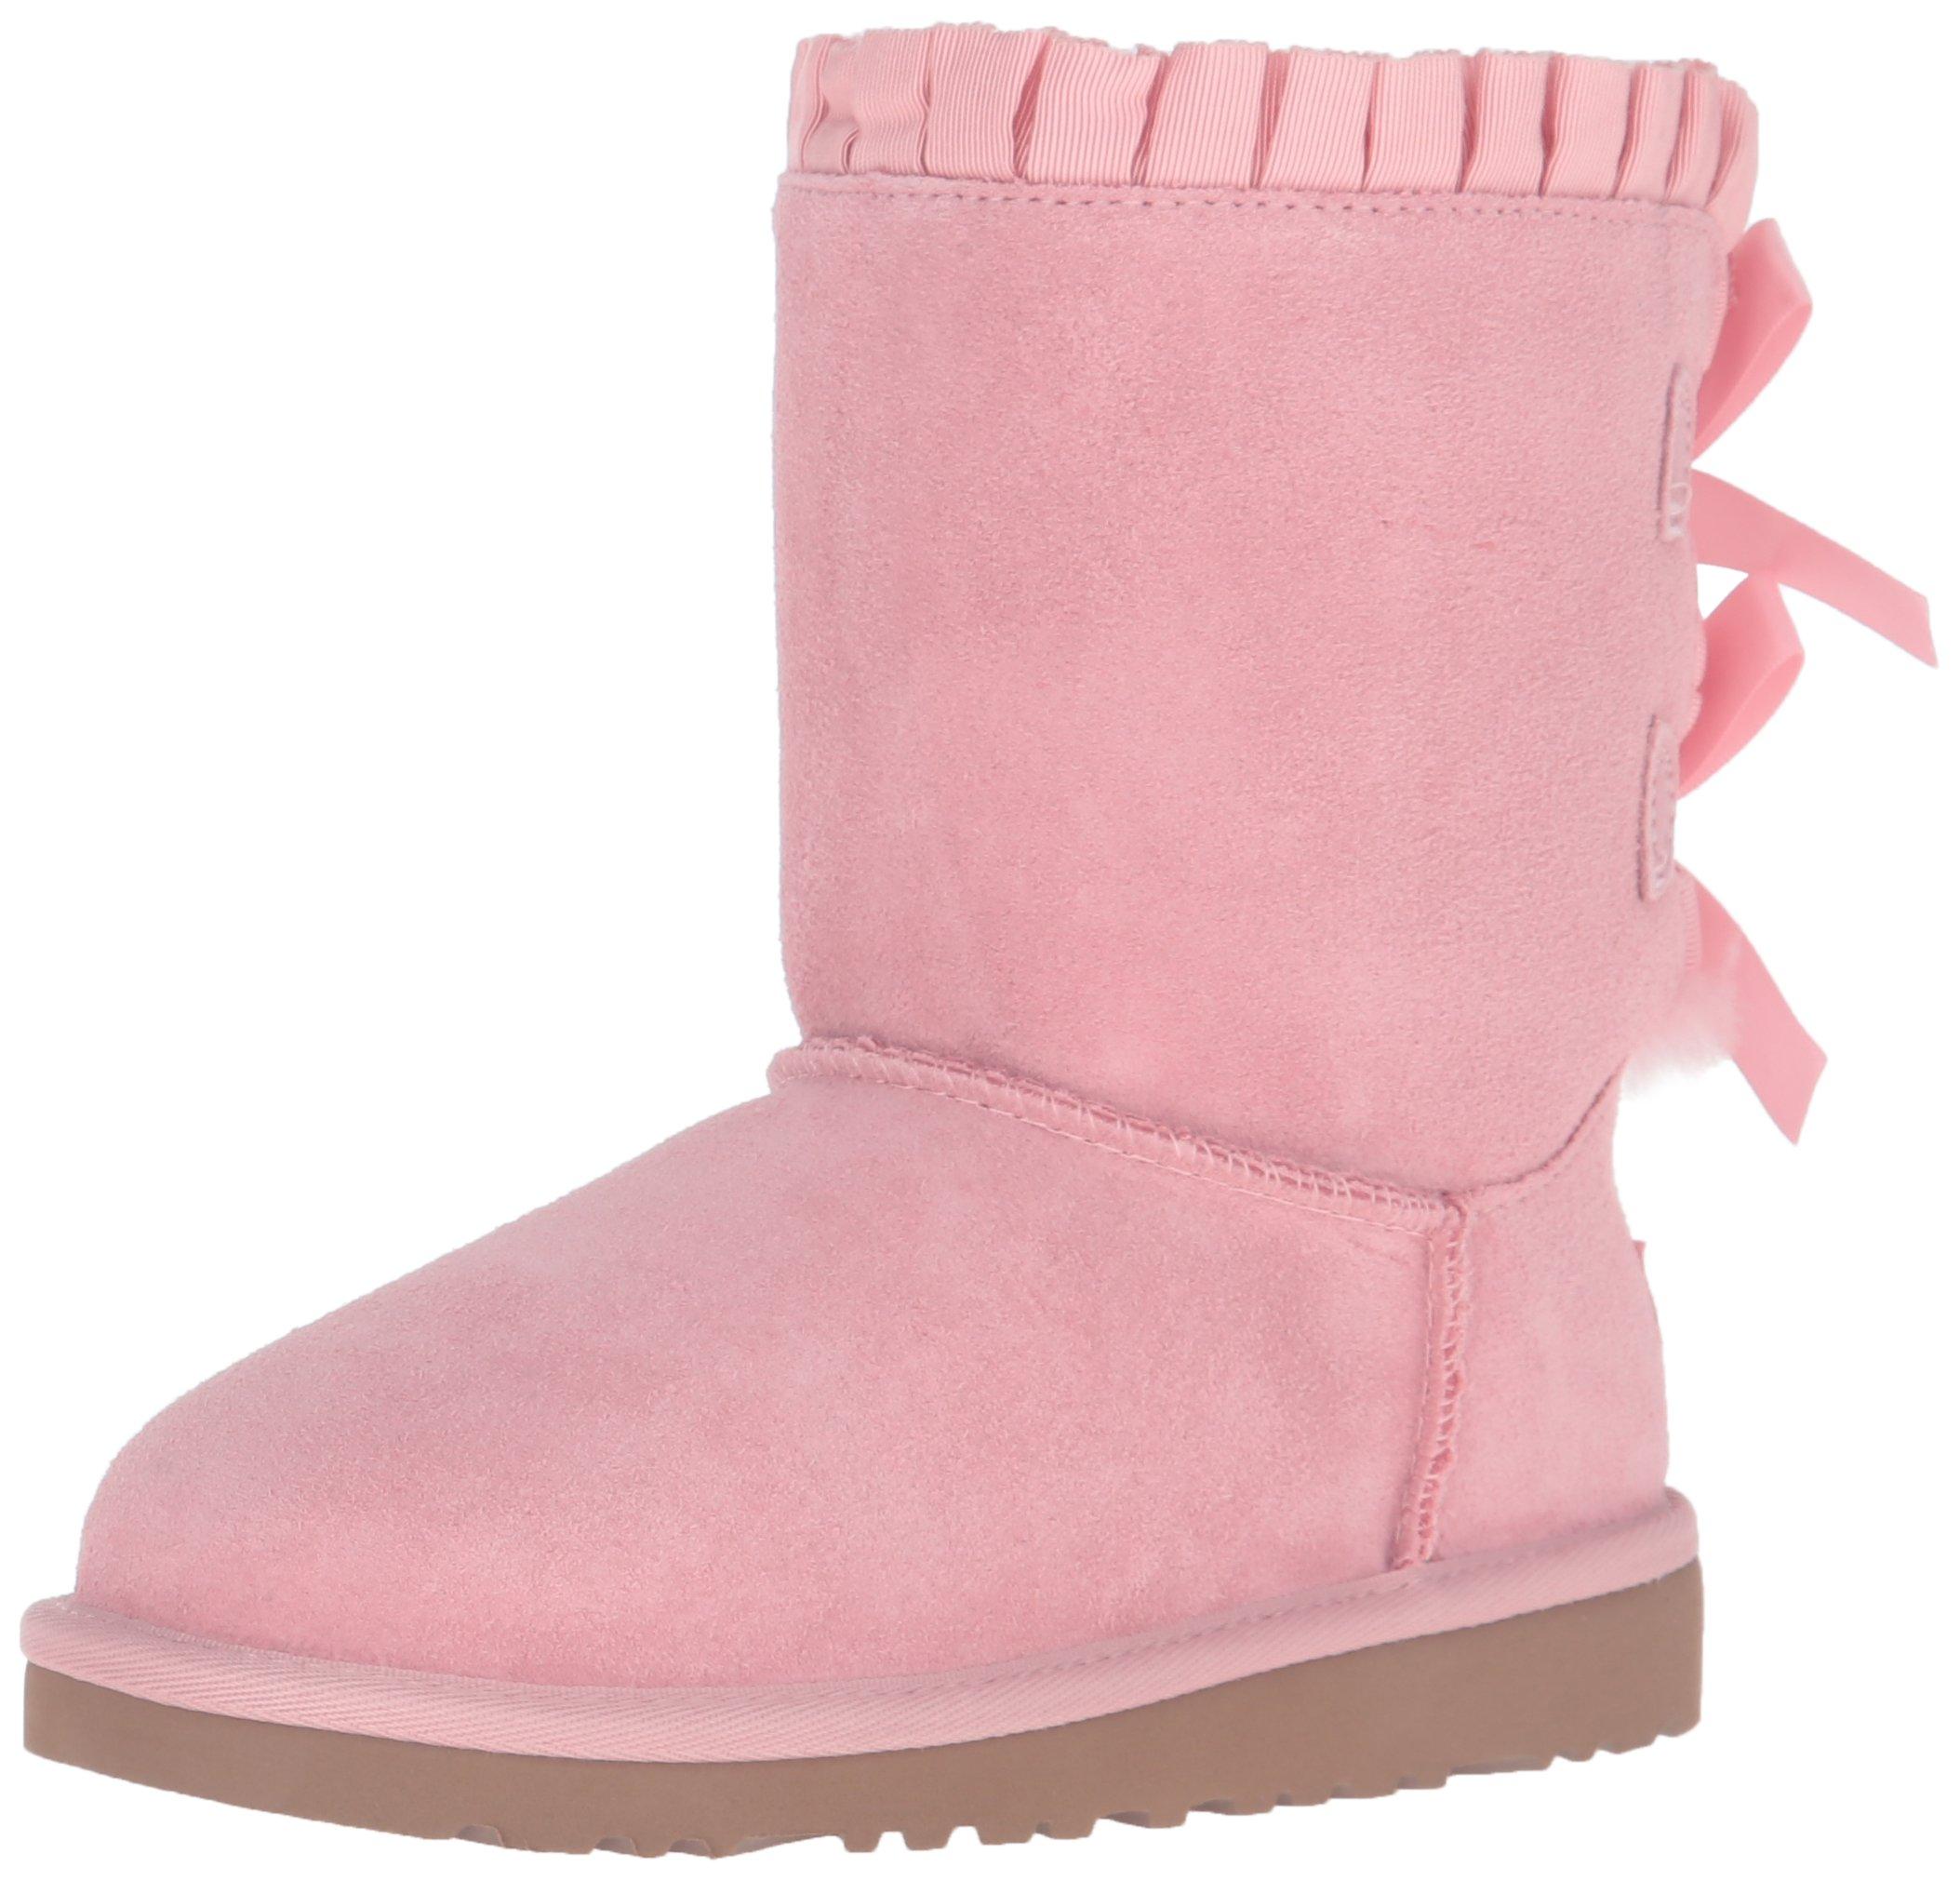 UGG Australia Kid's Bailey Bow Ruffles Boot, Baby Pink, 2